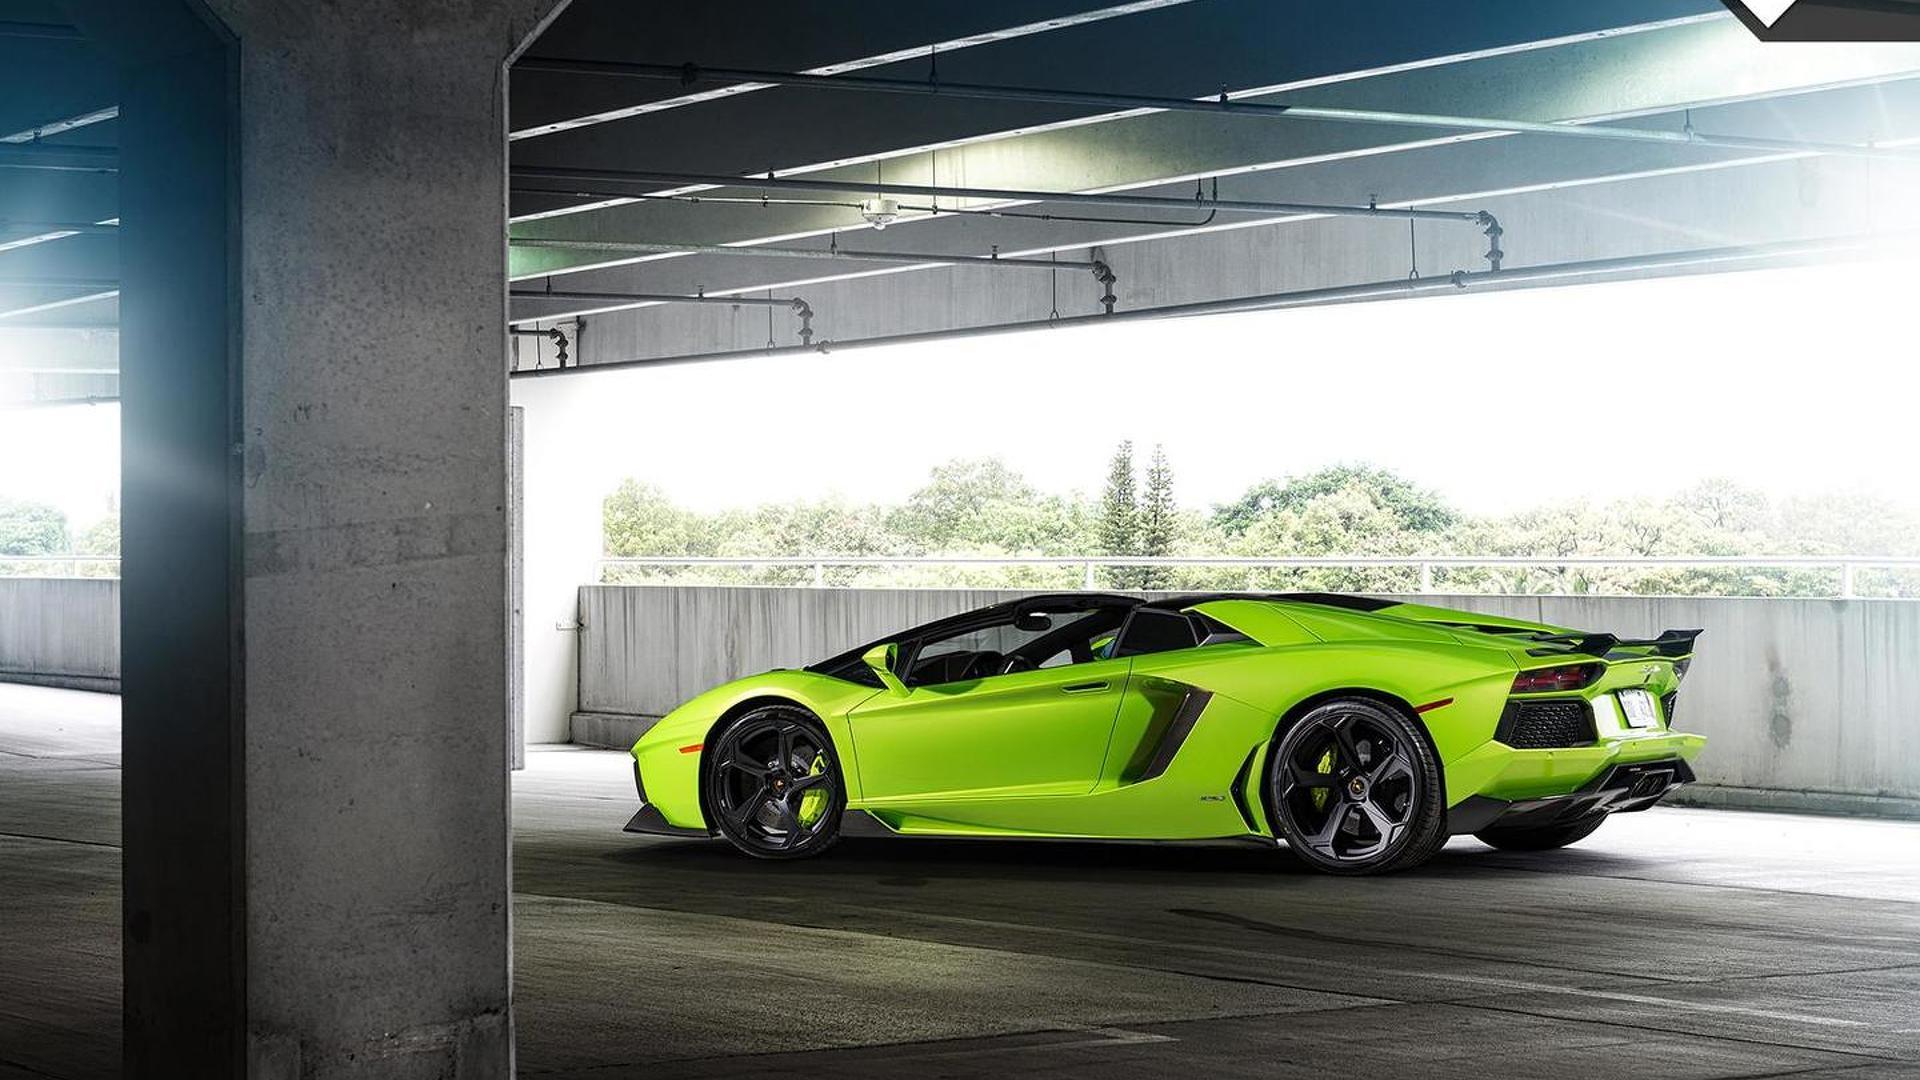 Тюнинг Lamborghini Aventador-V Roadster The Hulk от Vosteiner